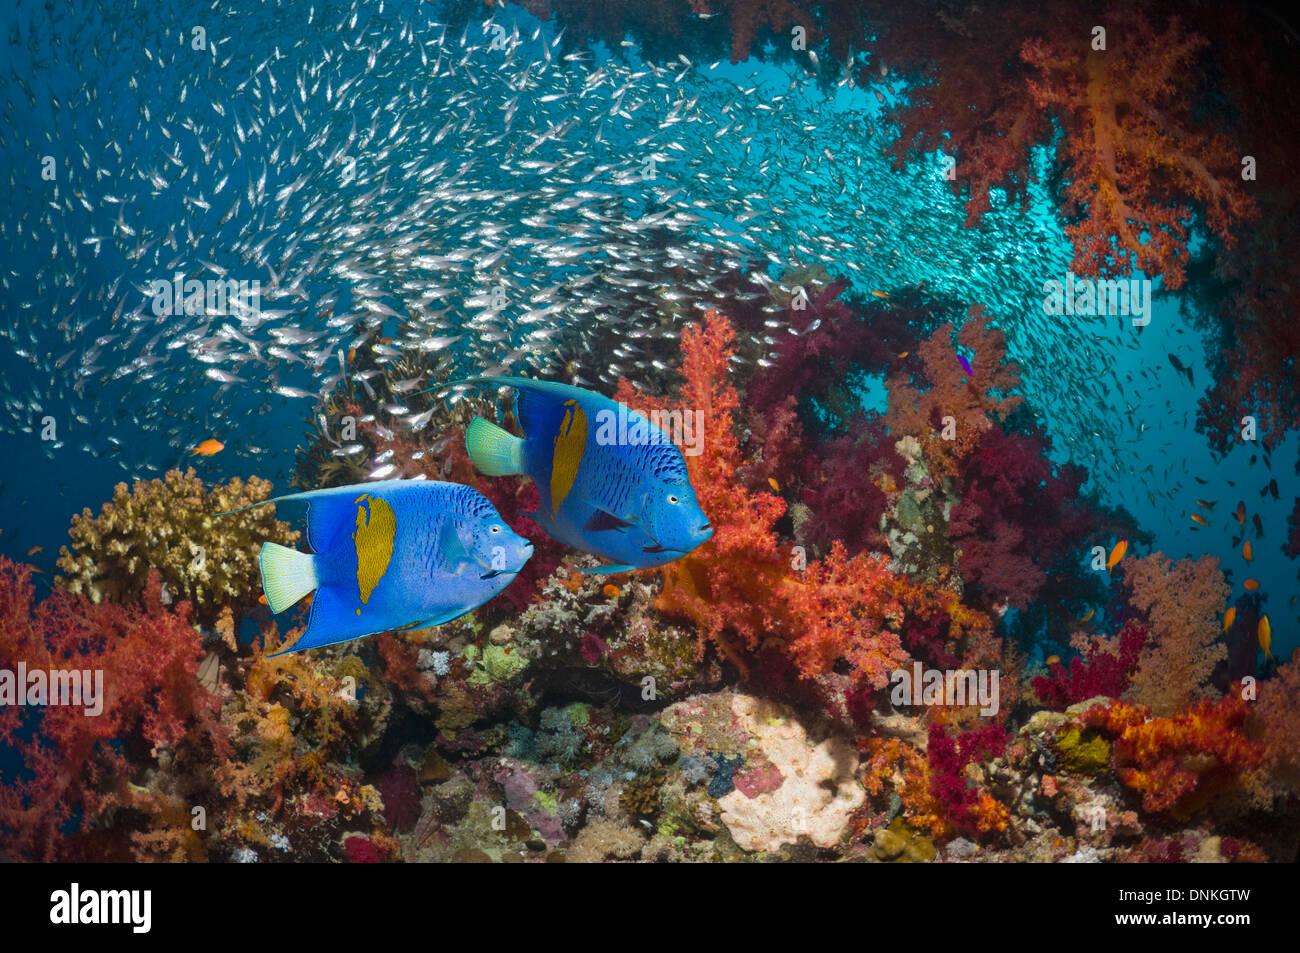 Coral reef scenery with Yellowbar angelfish - Stock Image